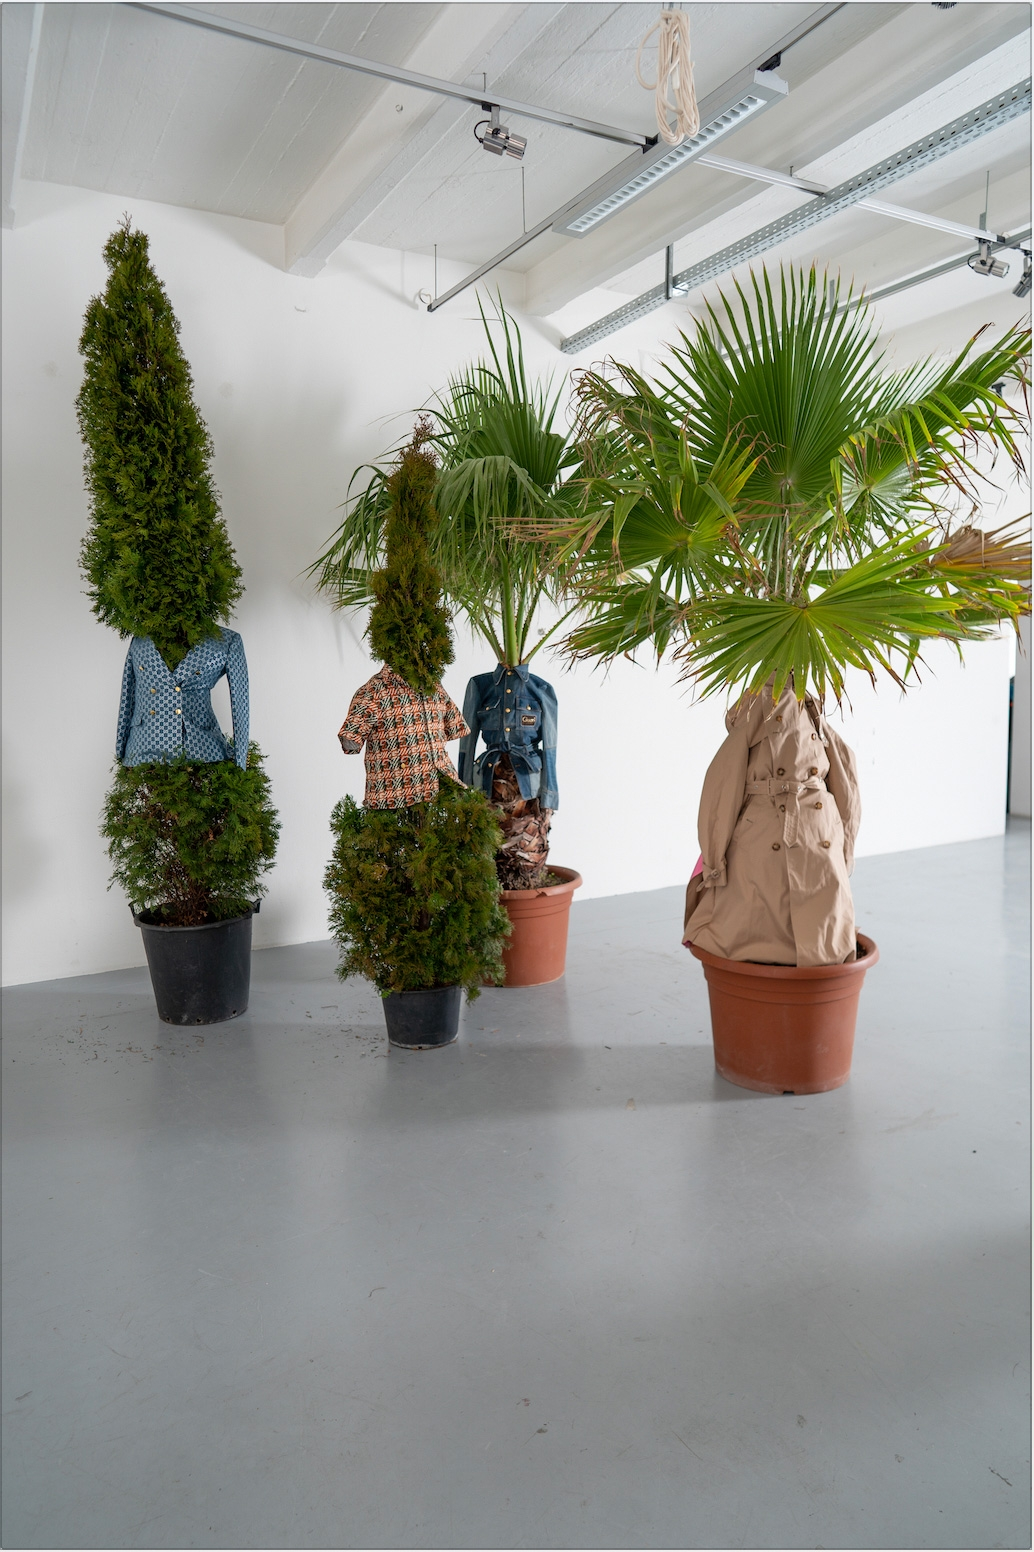 ERWIN WURM, One Minute Sculpture, 2020